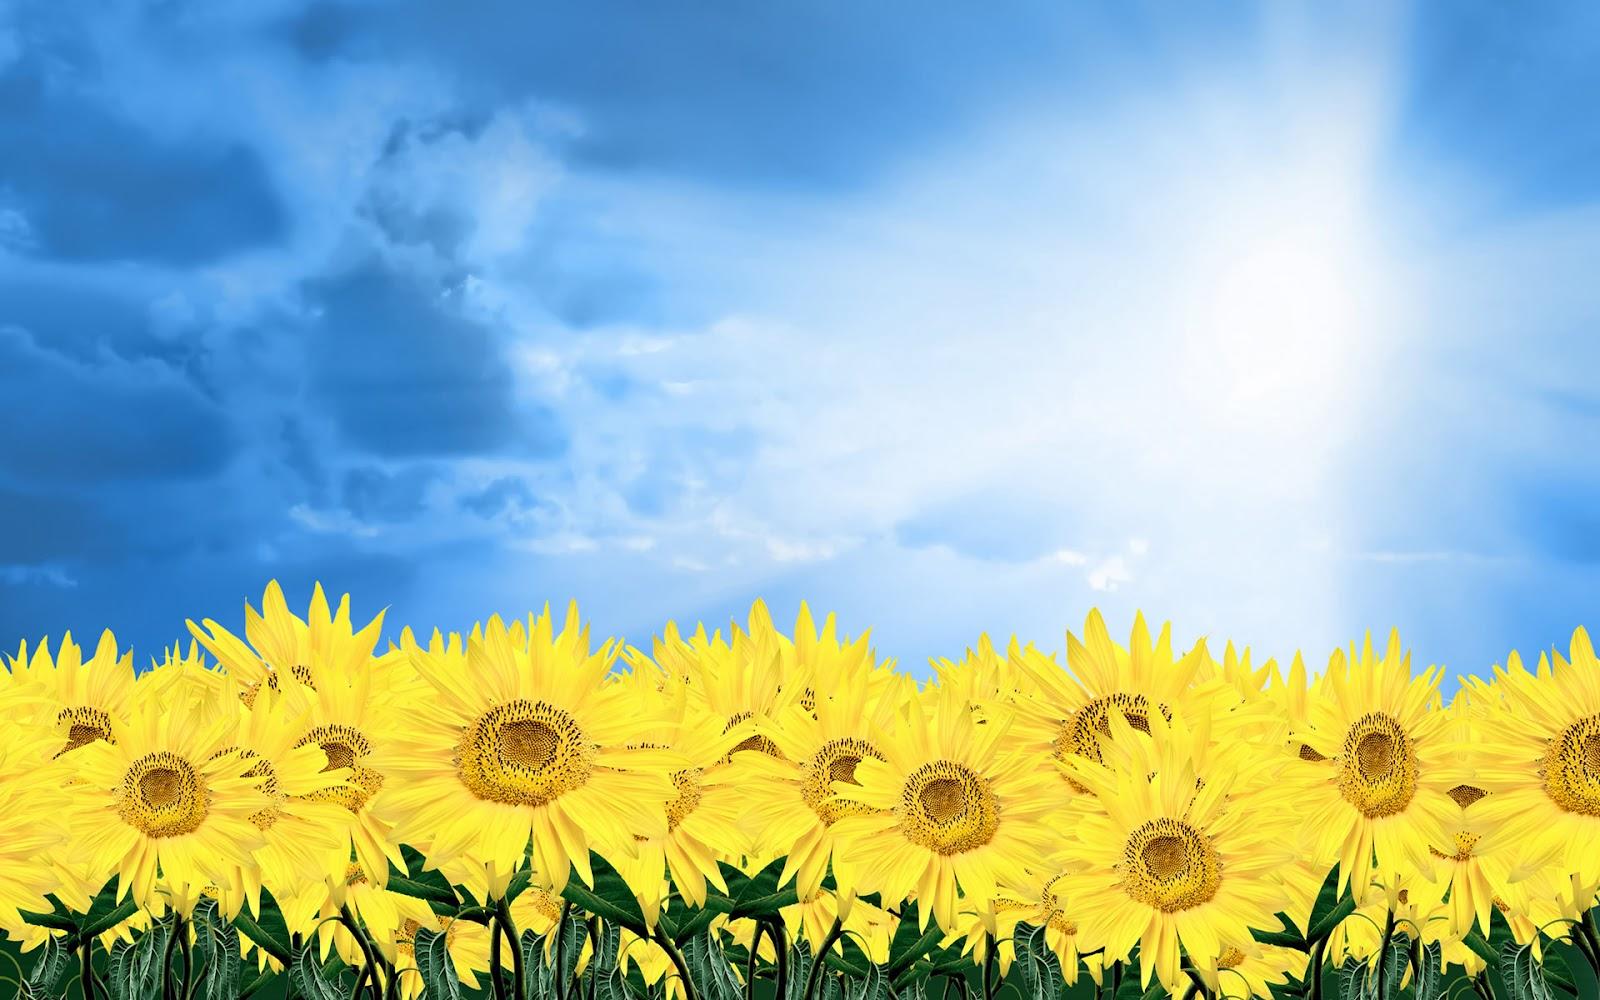 http://2.bp.blogspot.com/-7Qiy4oFl4Tk/T0E0k3wfIdI/AAAAAAAAJ0c/PdgipJqIcwg/s1600/HD+flowers+wallpapers.+(3).jpg